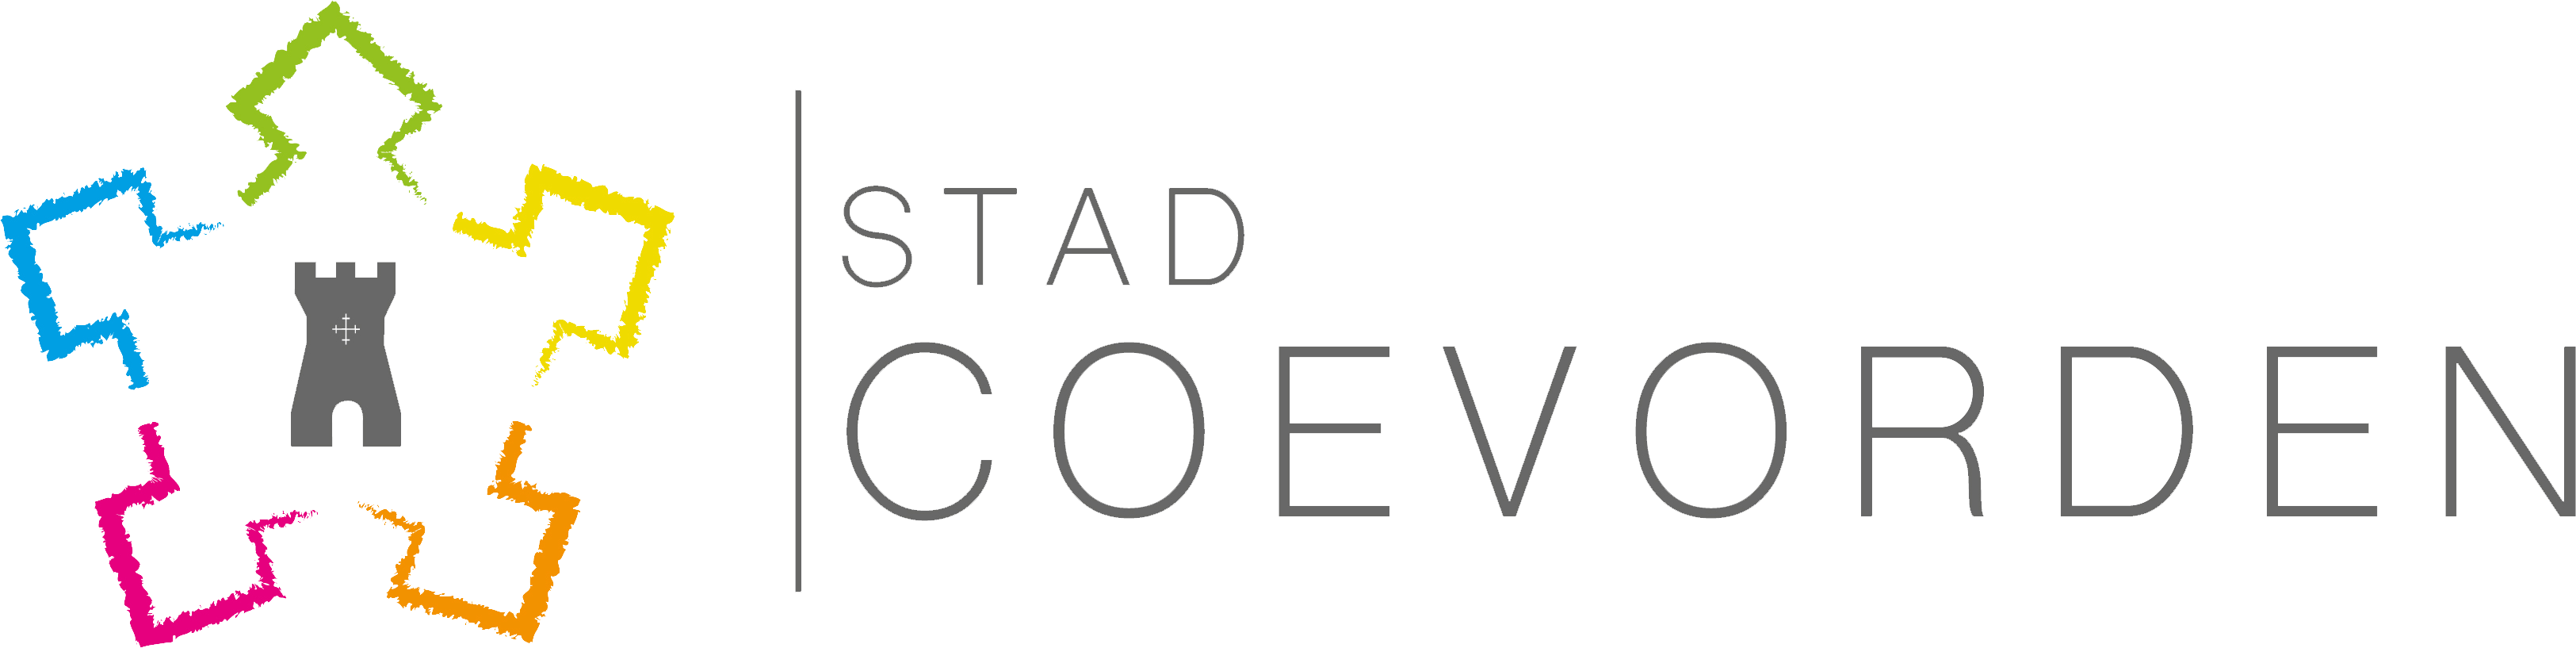 Stad Coevorden